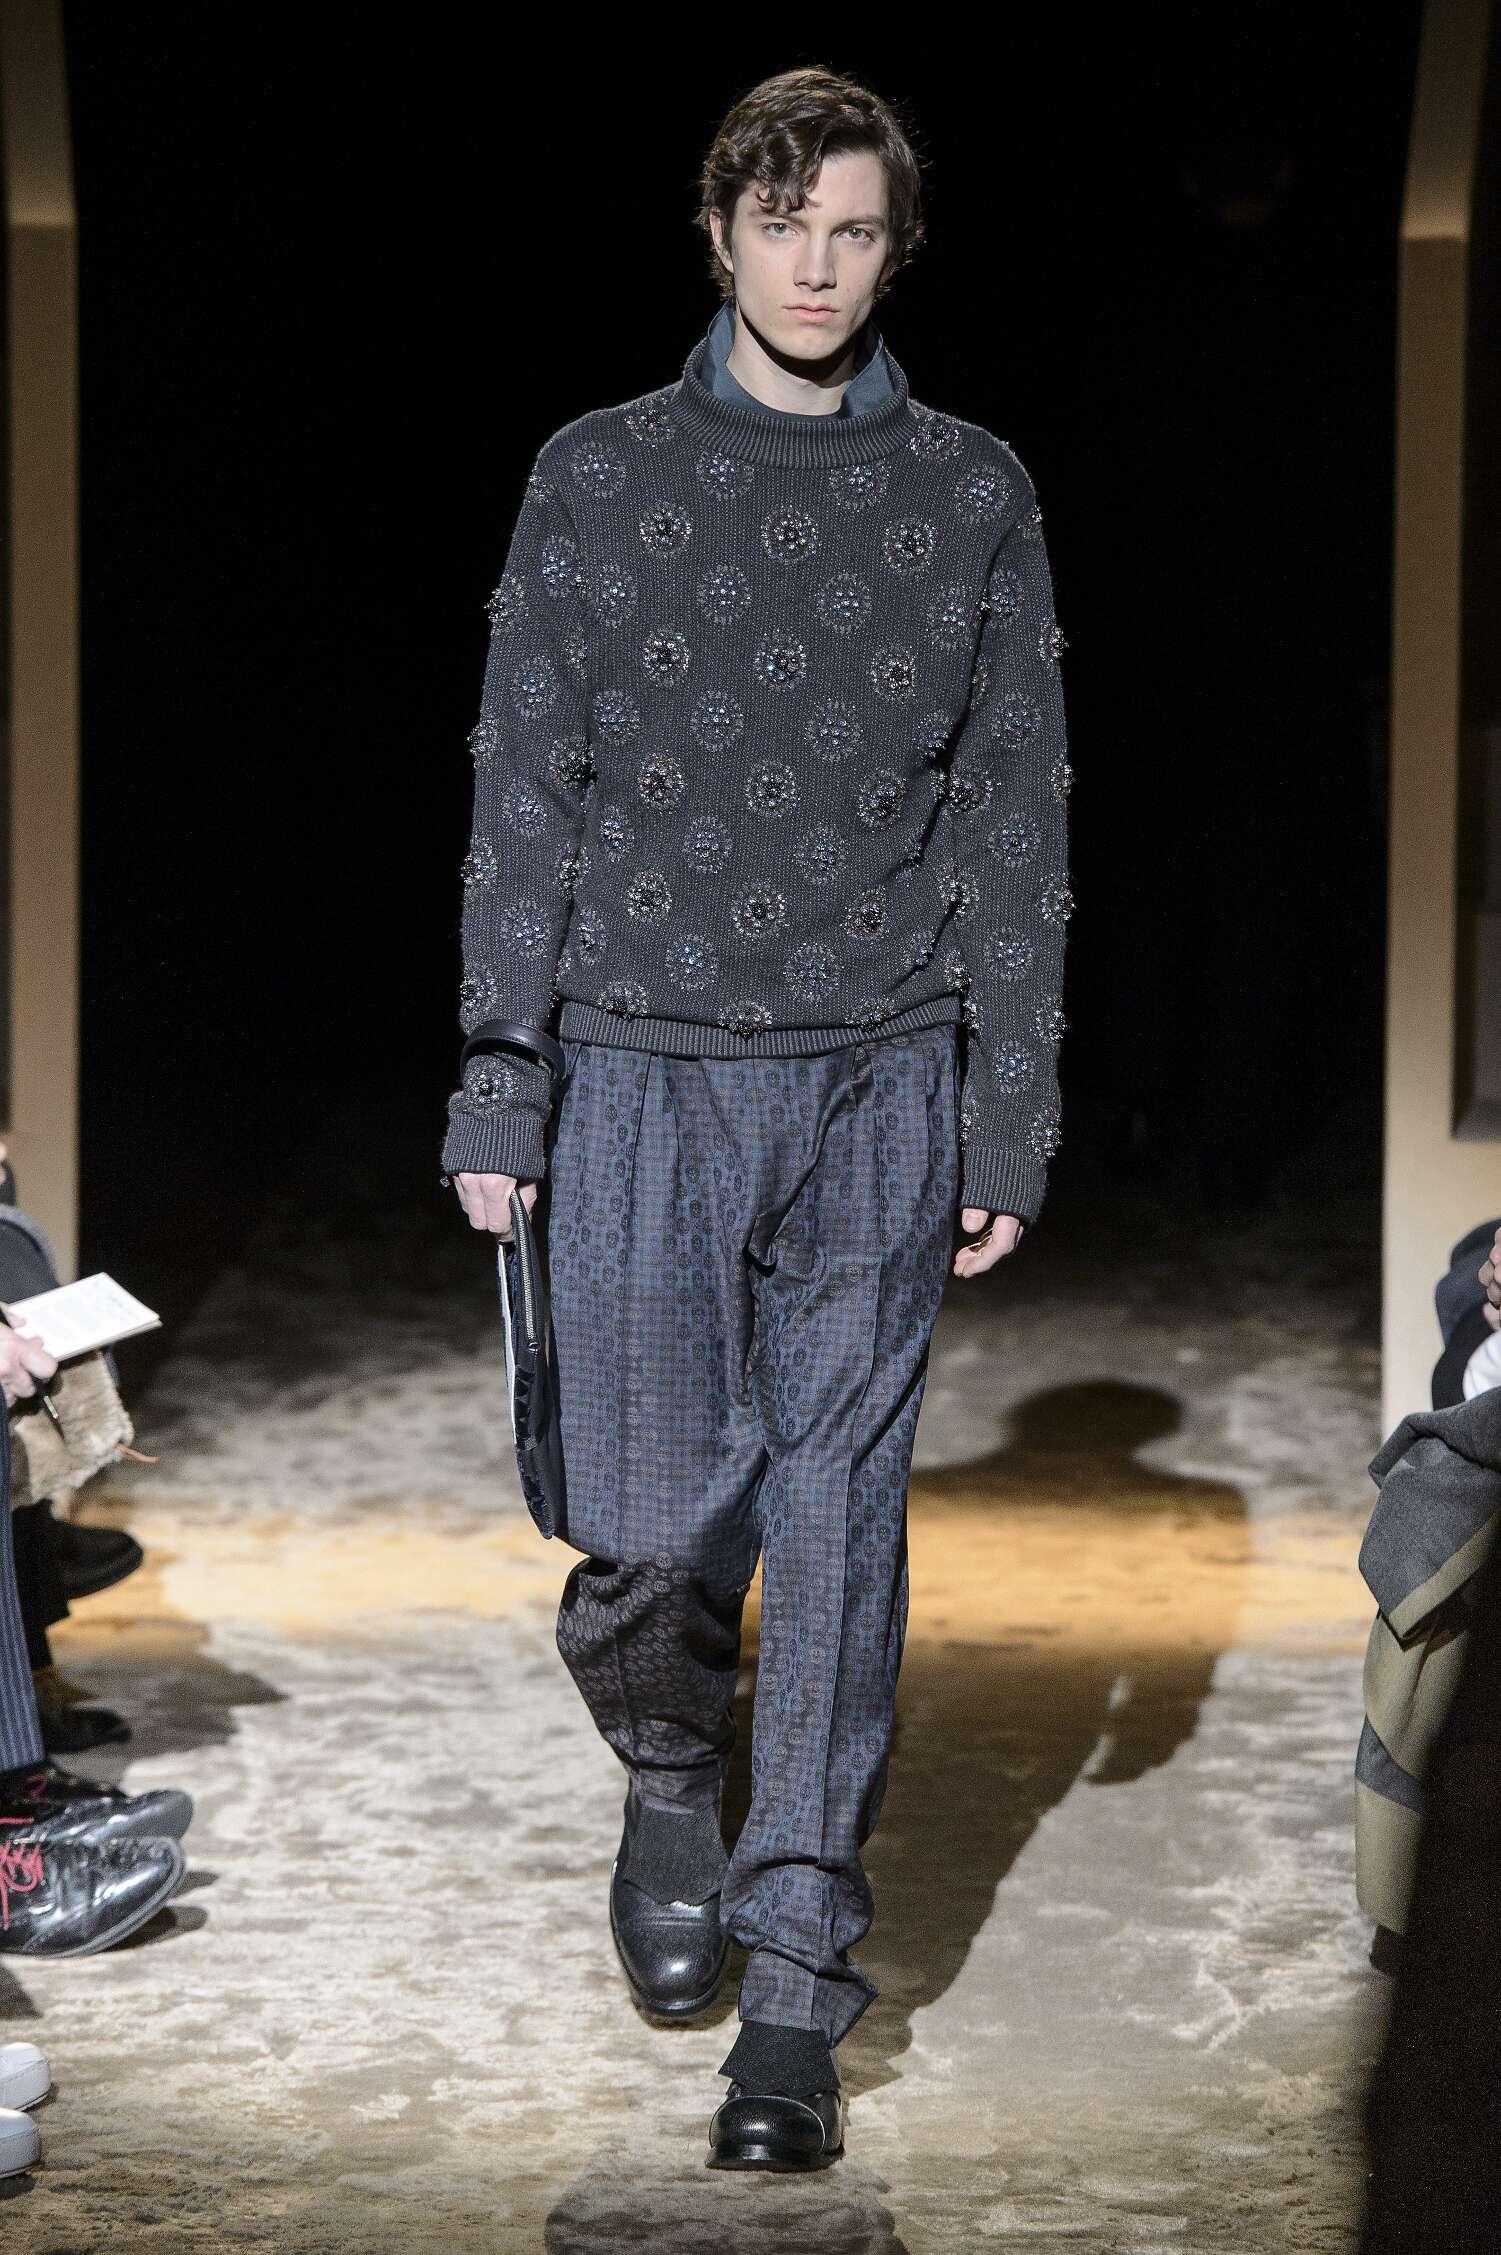 Catwalk Ermenegildo Zegna Couture Man Fashion Show Winter 2016